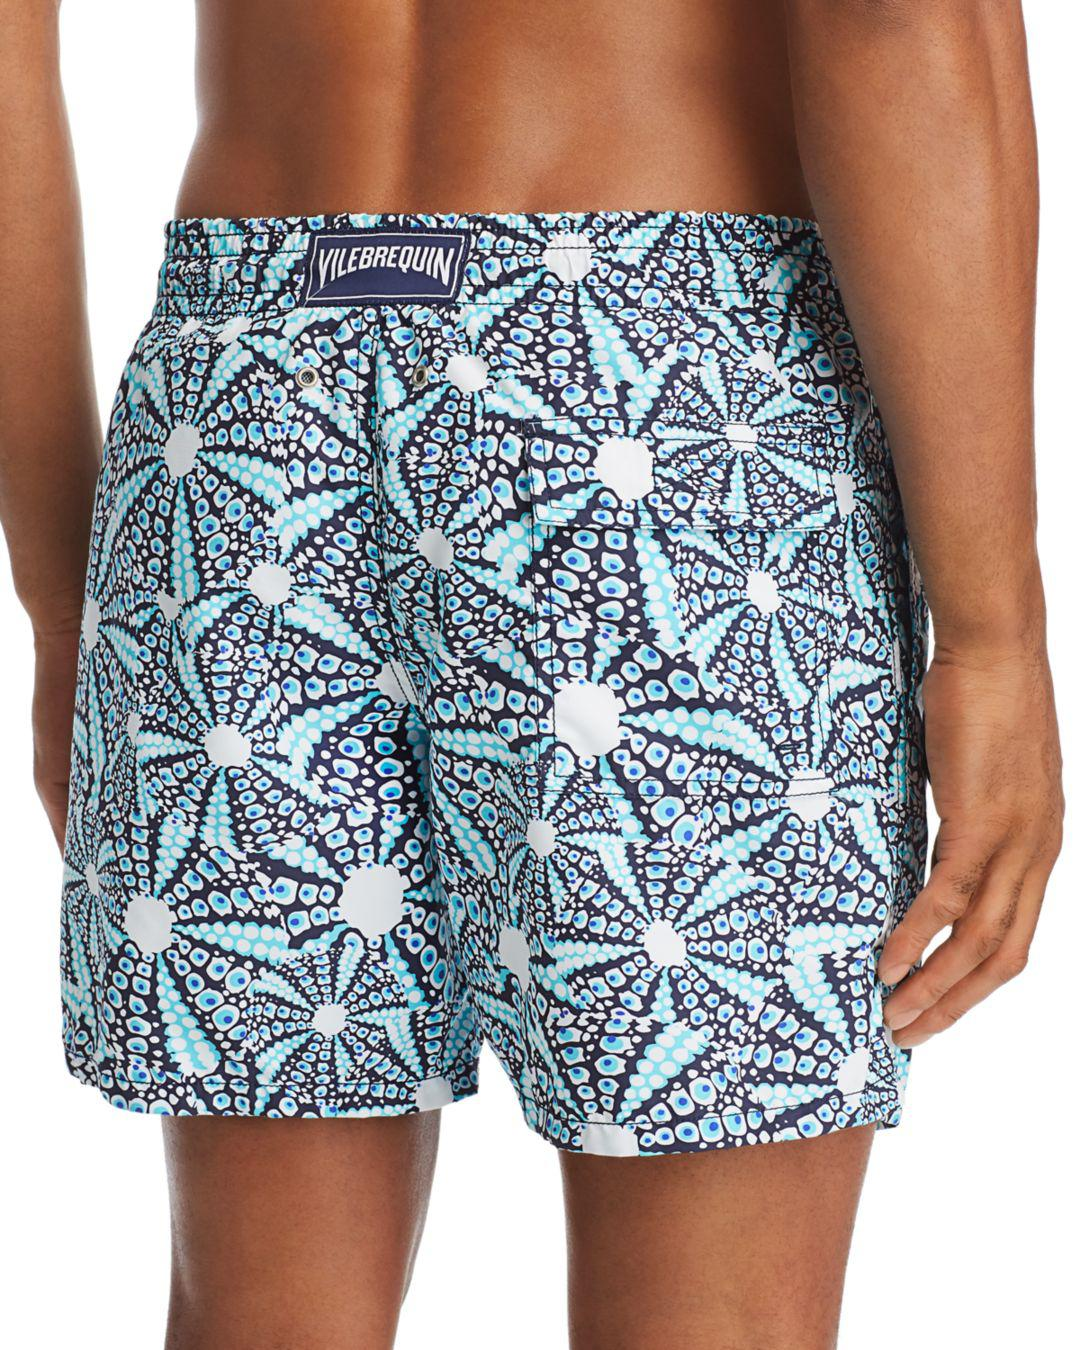 81ce46d2fe Vilebrequin Moorea Oursinade Printed Swim Shorts in Blue for Men - Lyst